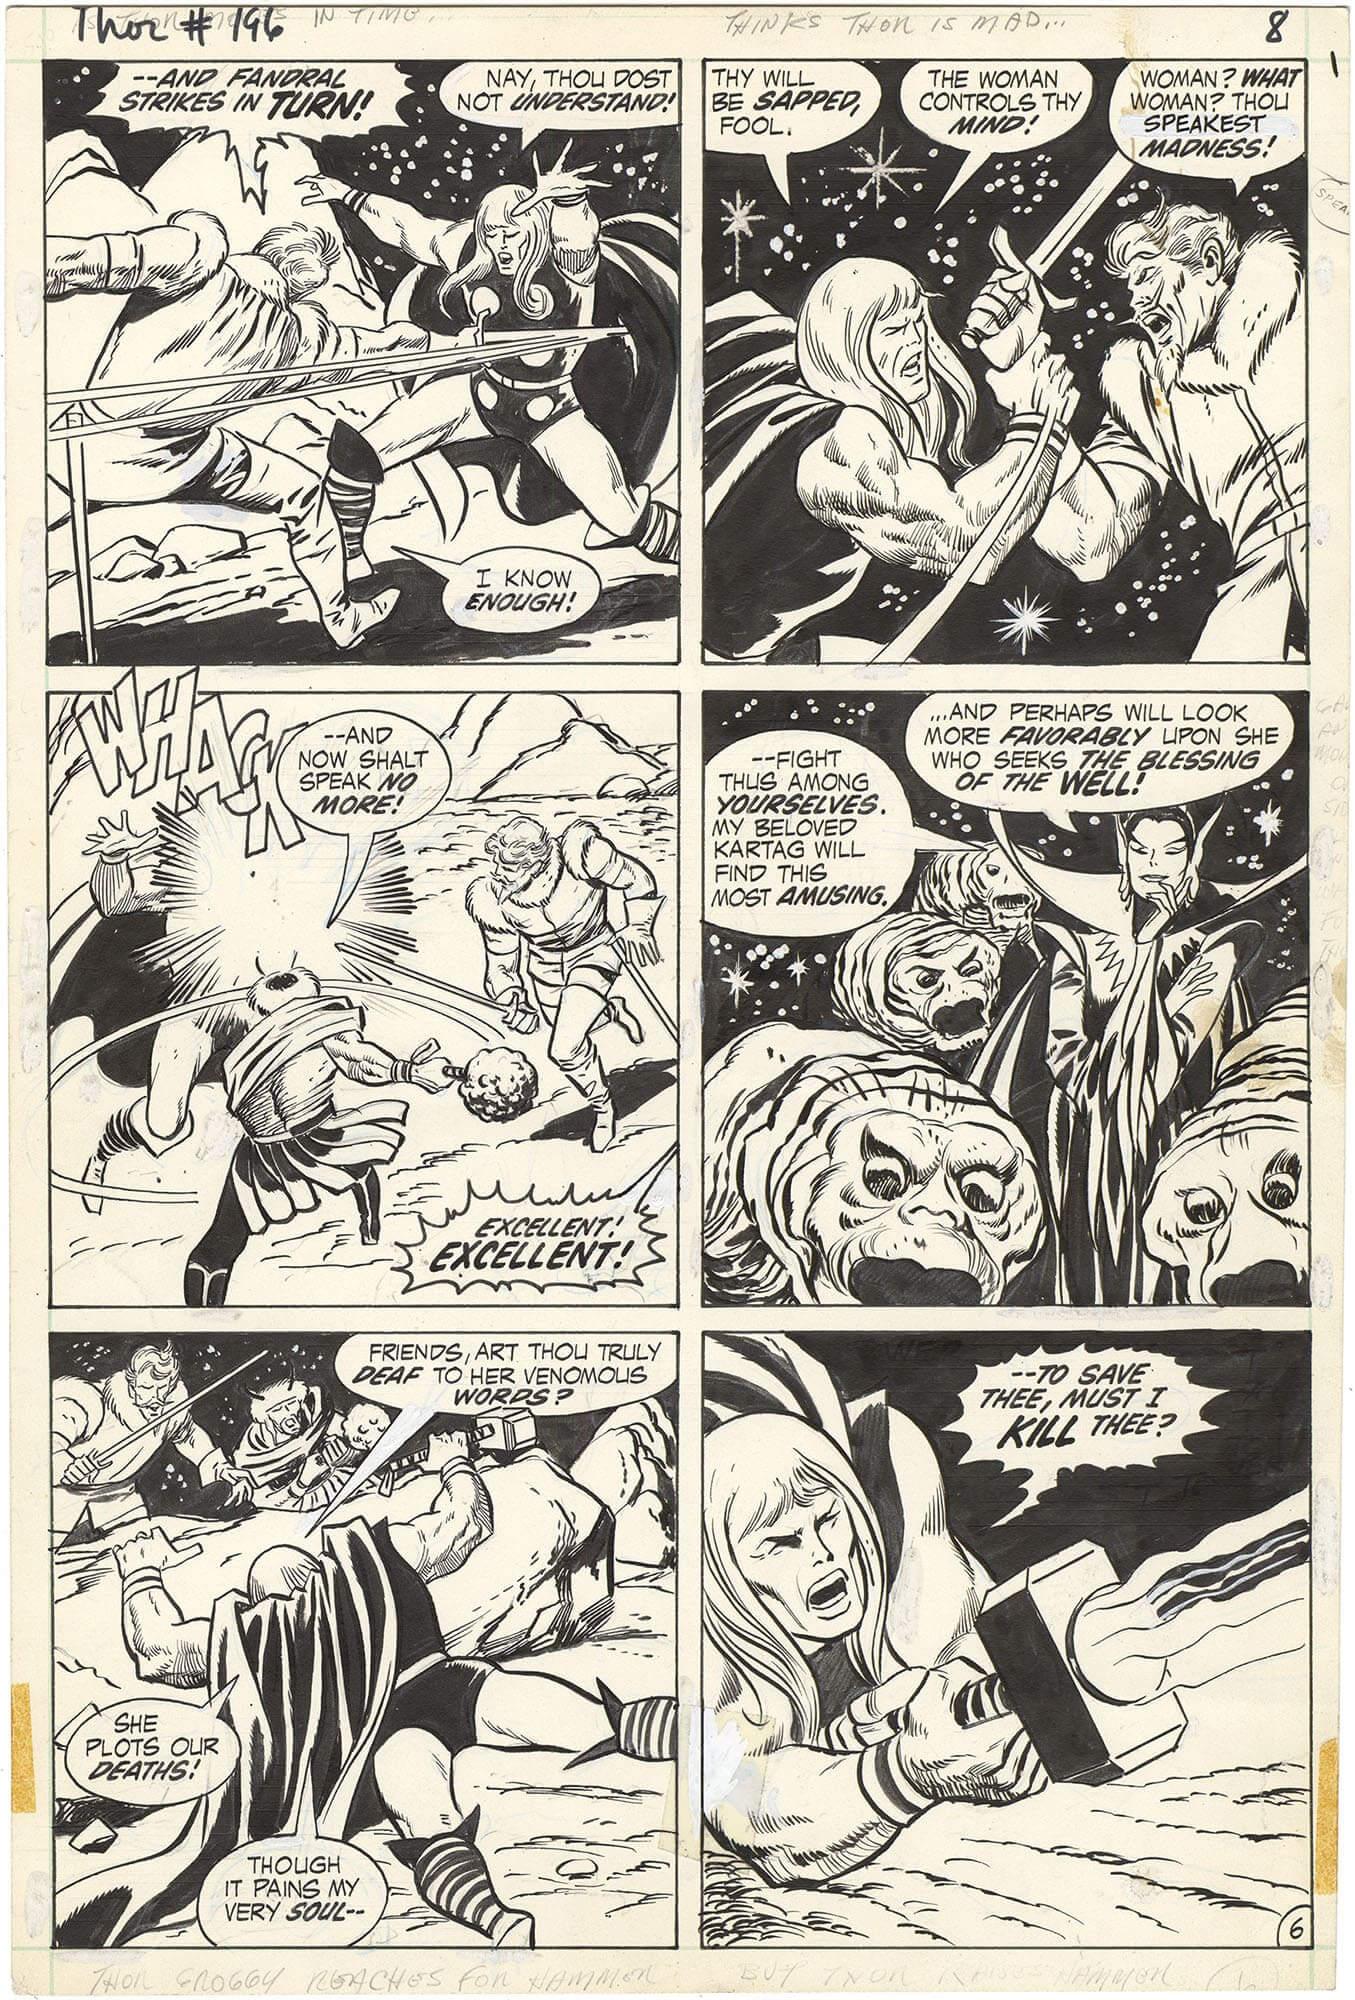 Thor #196 p6